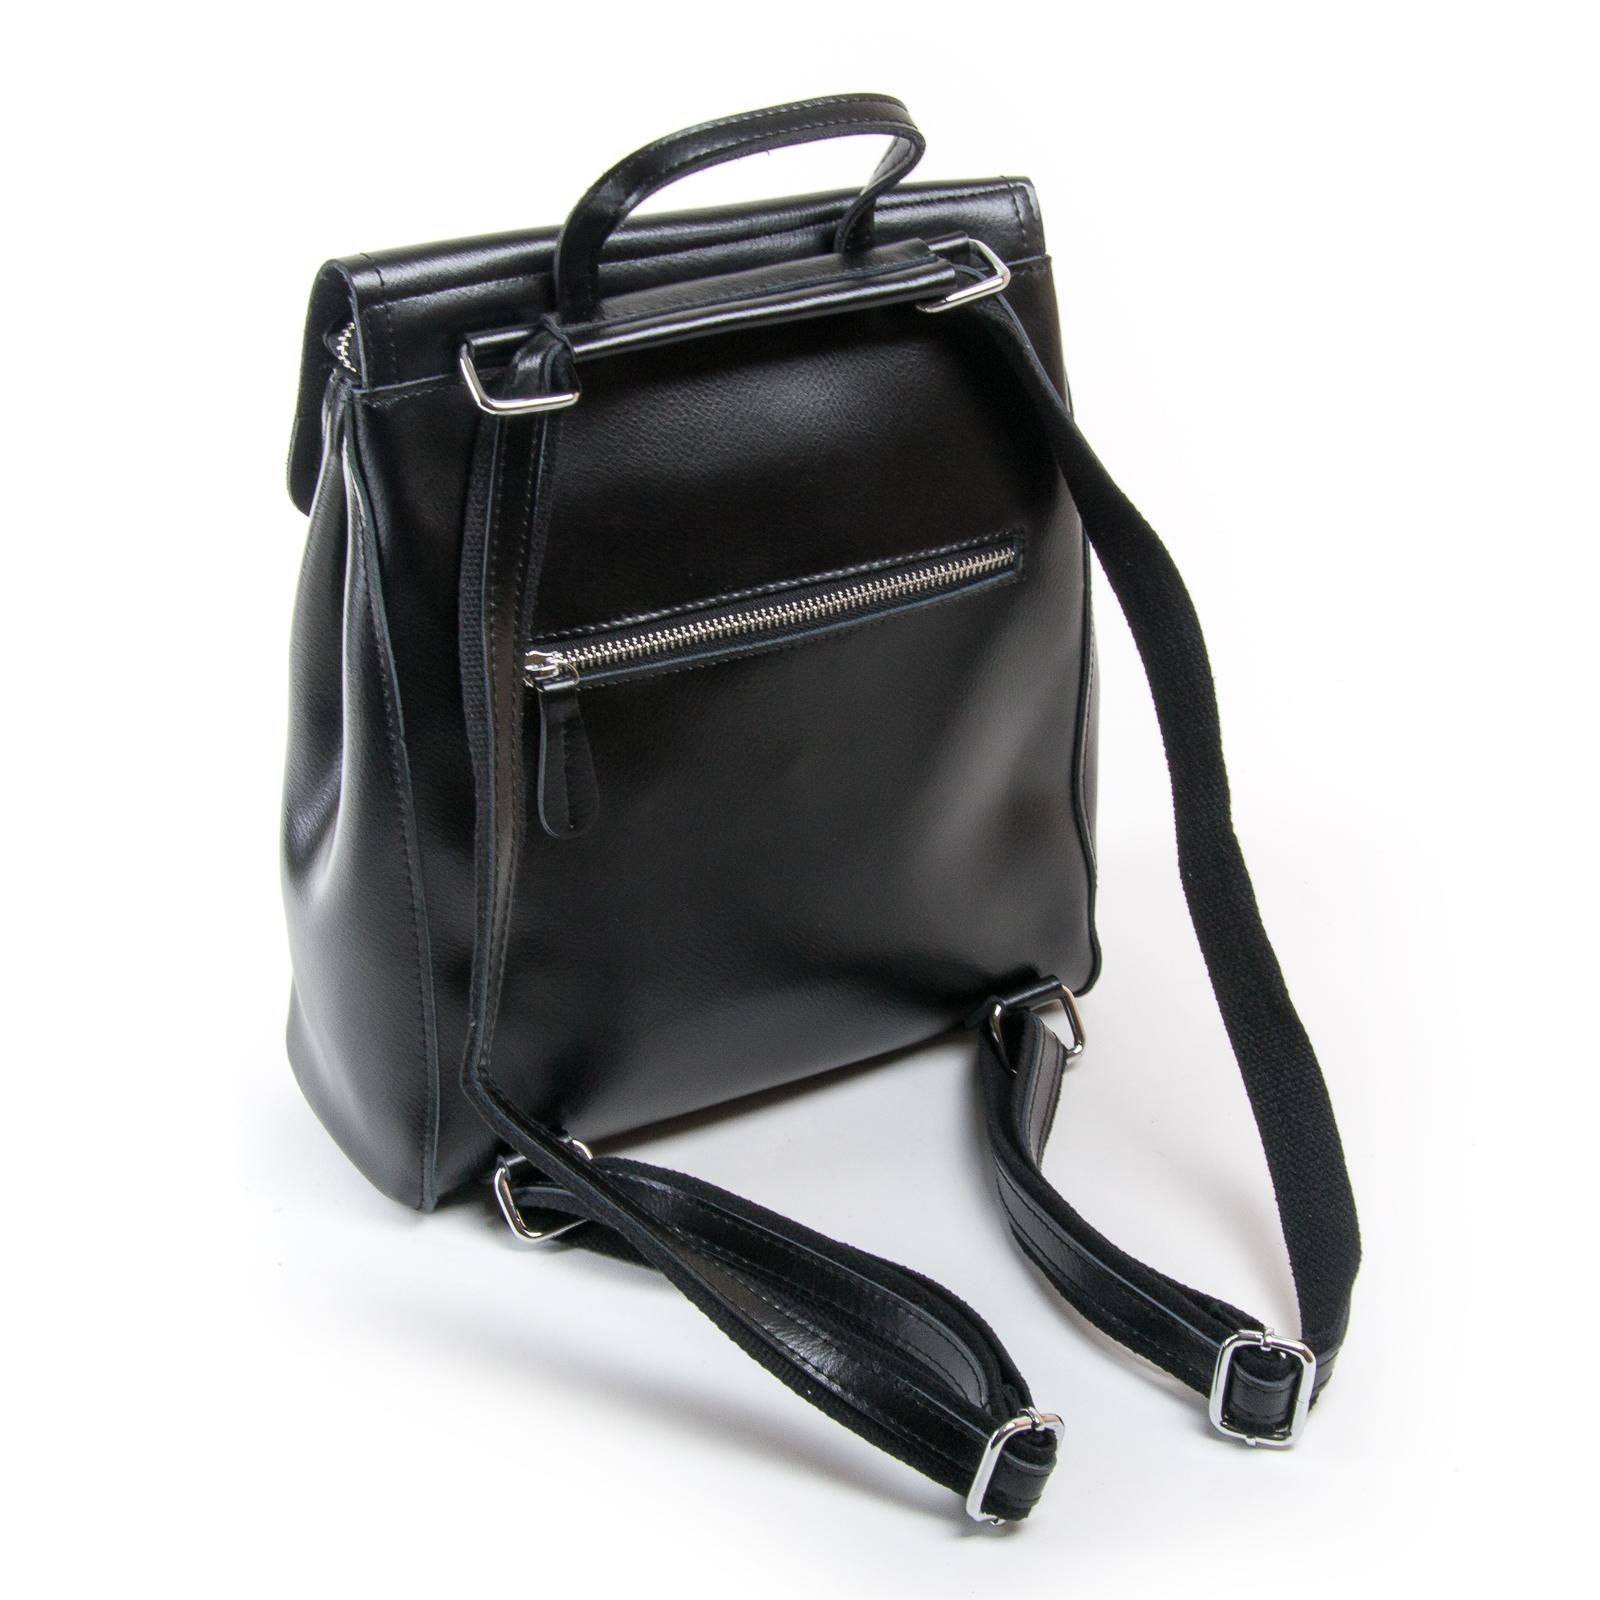 Сумка Женская Рюкзак кожа ALEX RAI 03-01 1005 black - фото 4